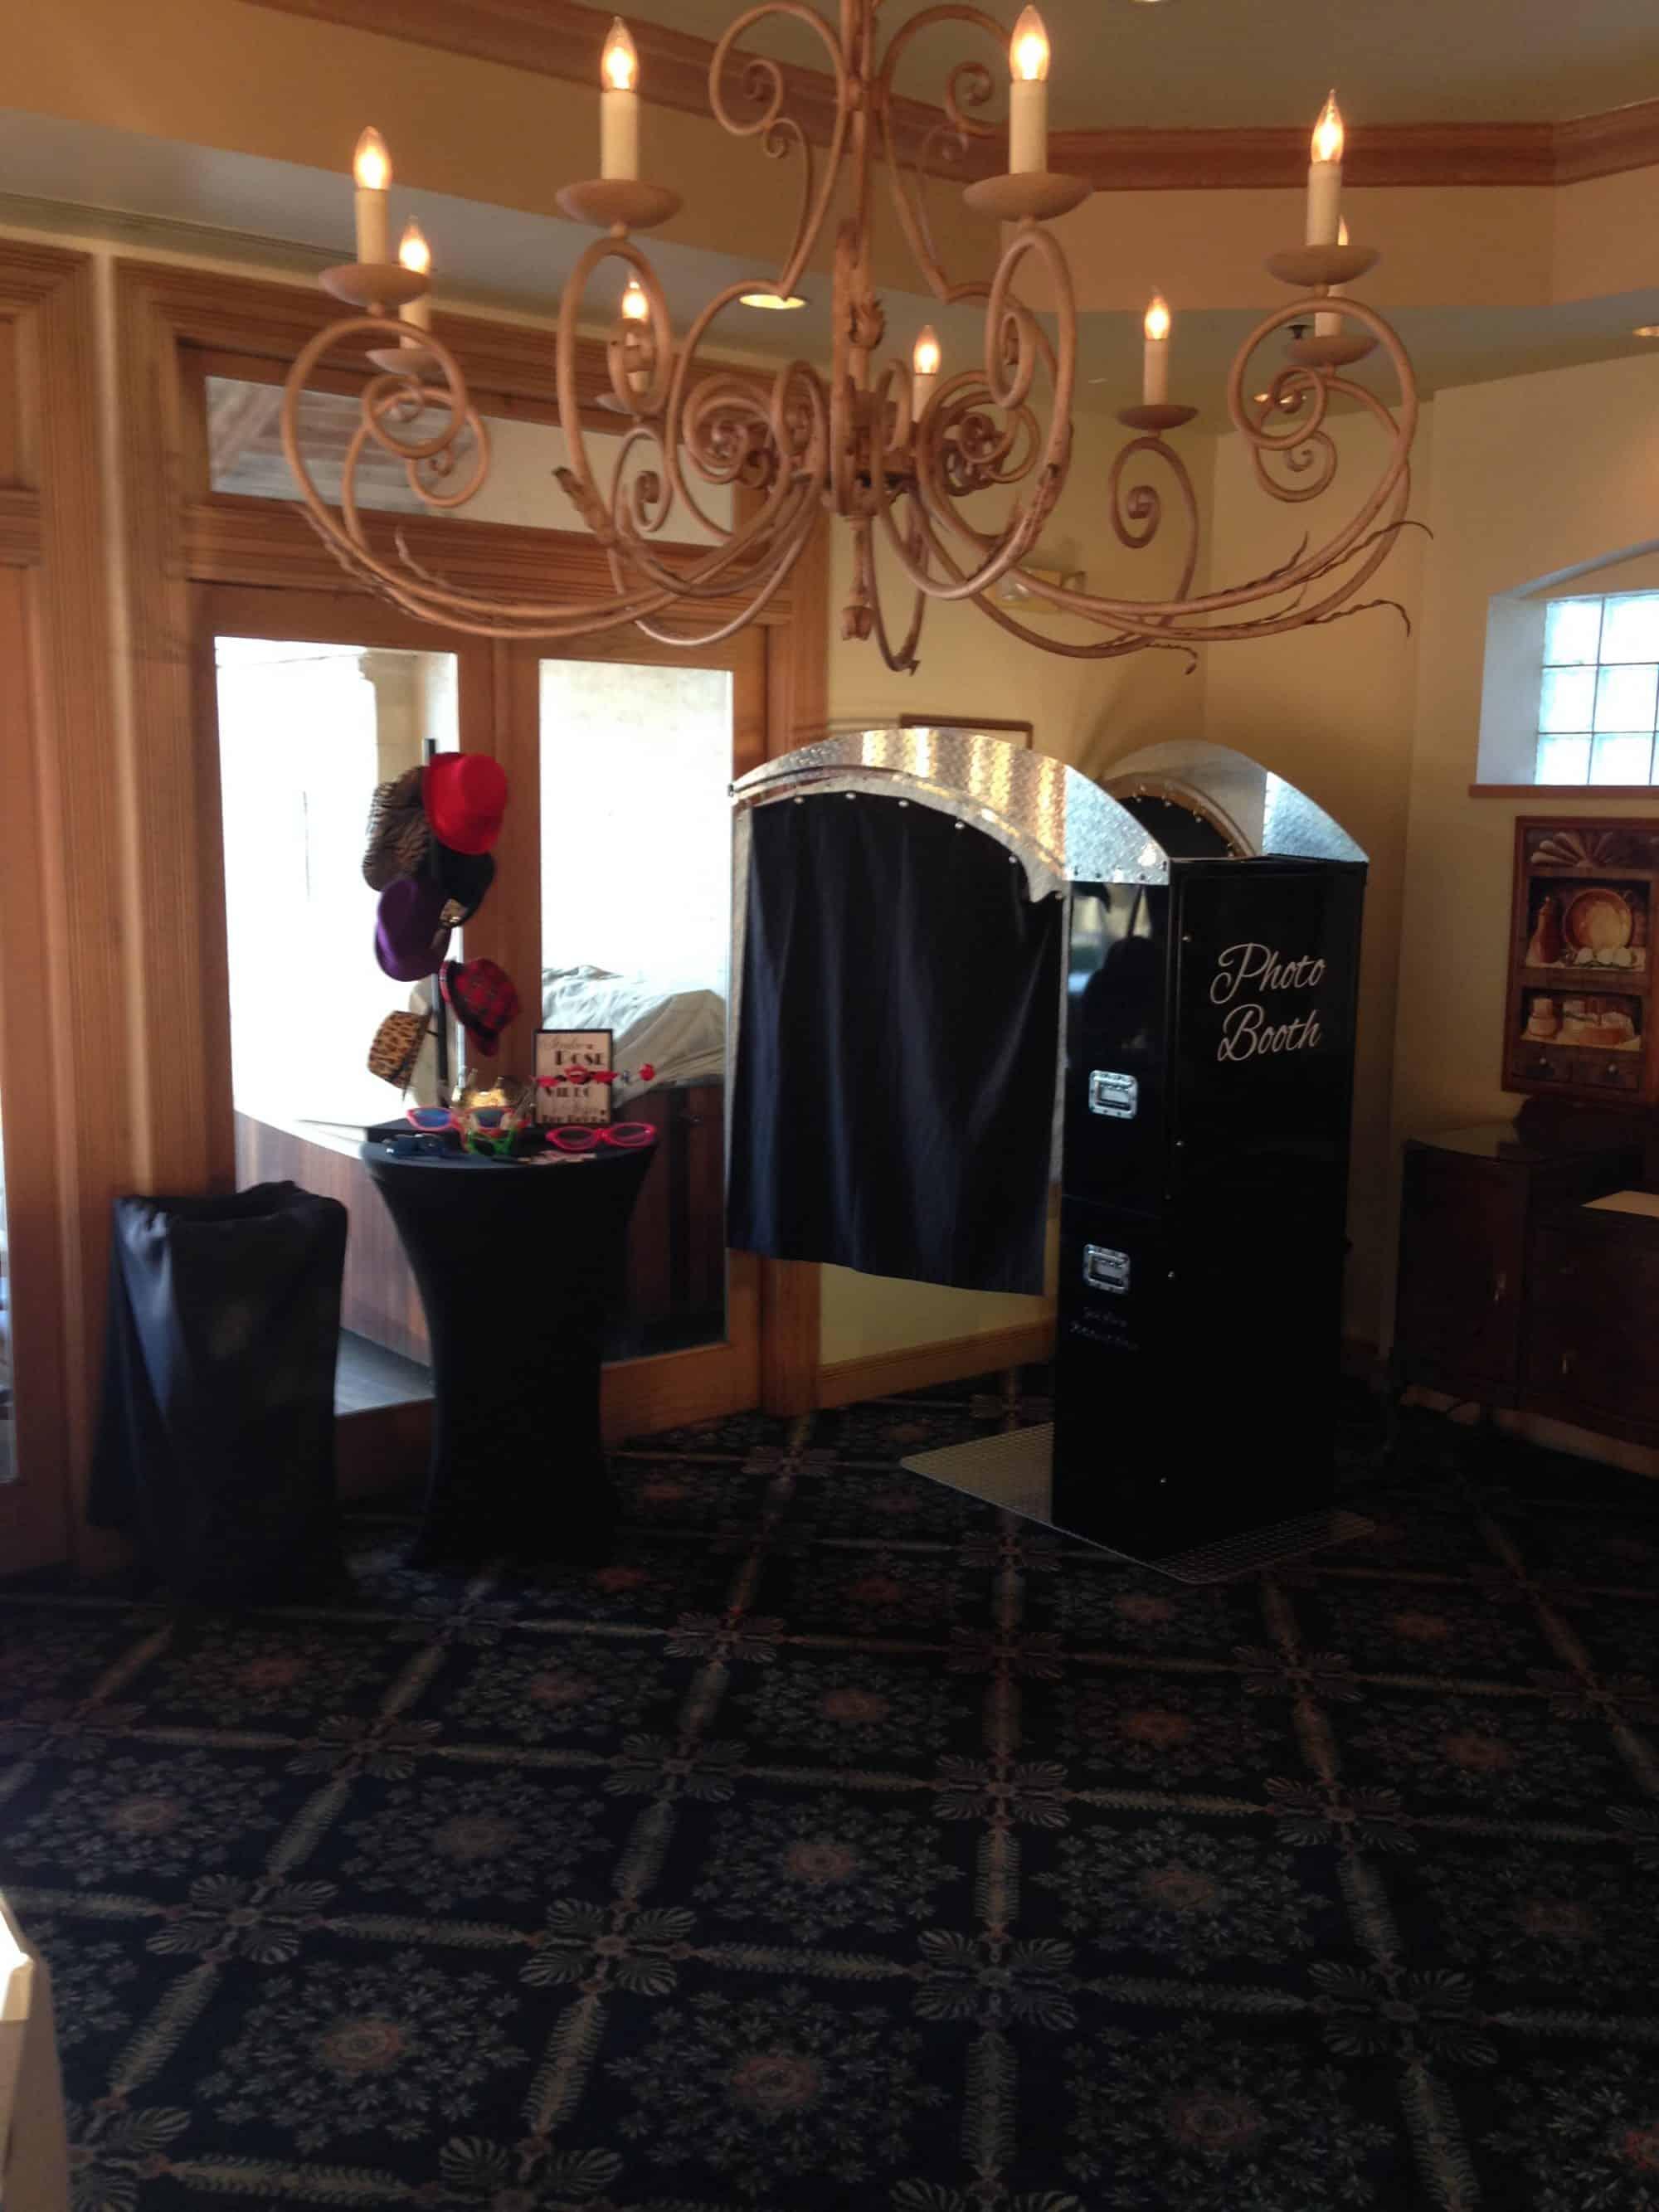 Orlando Photo Booth Rental - Mission Inn La Hacienda - The Printz